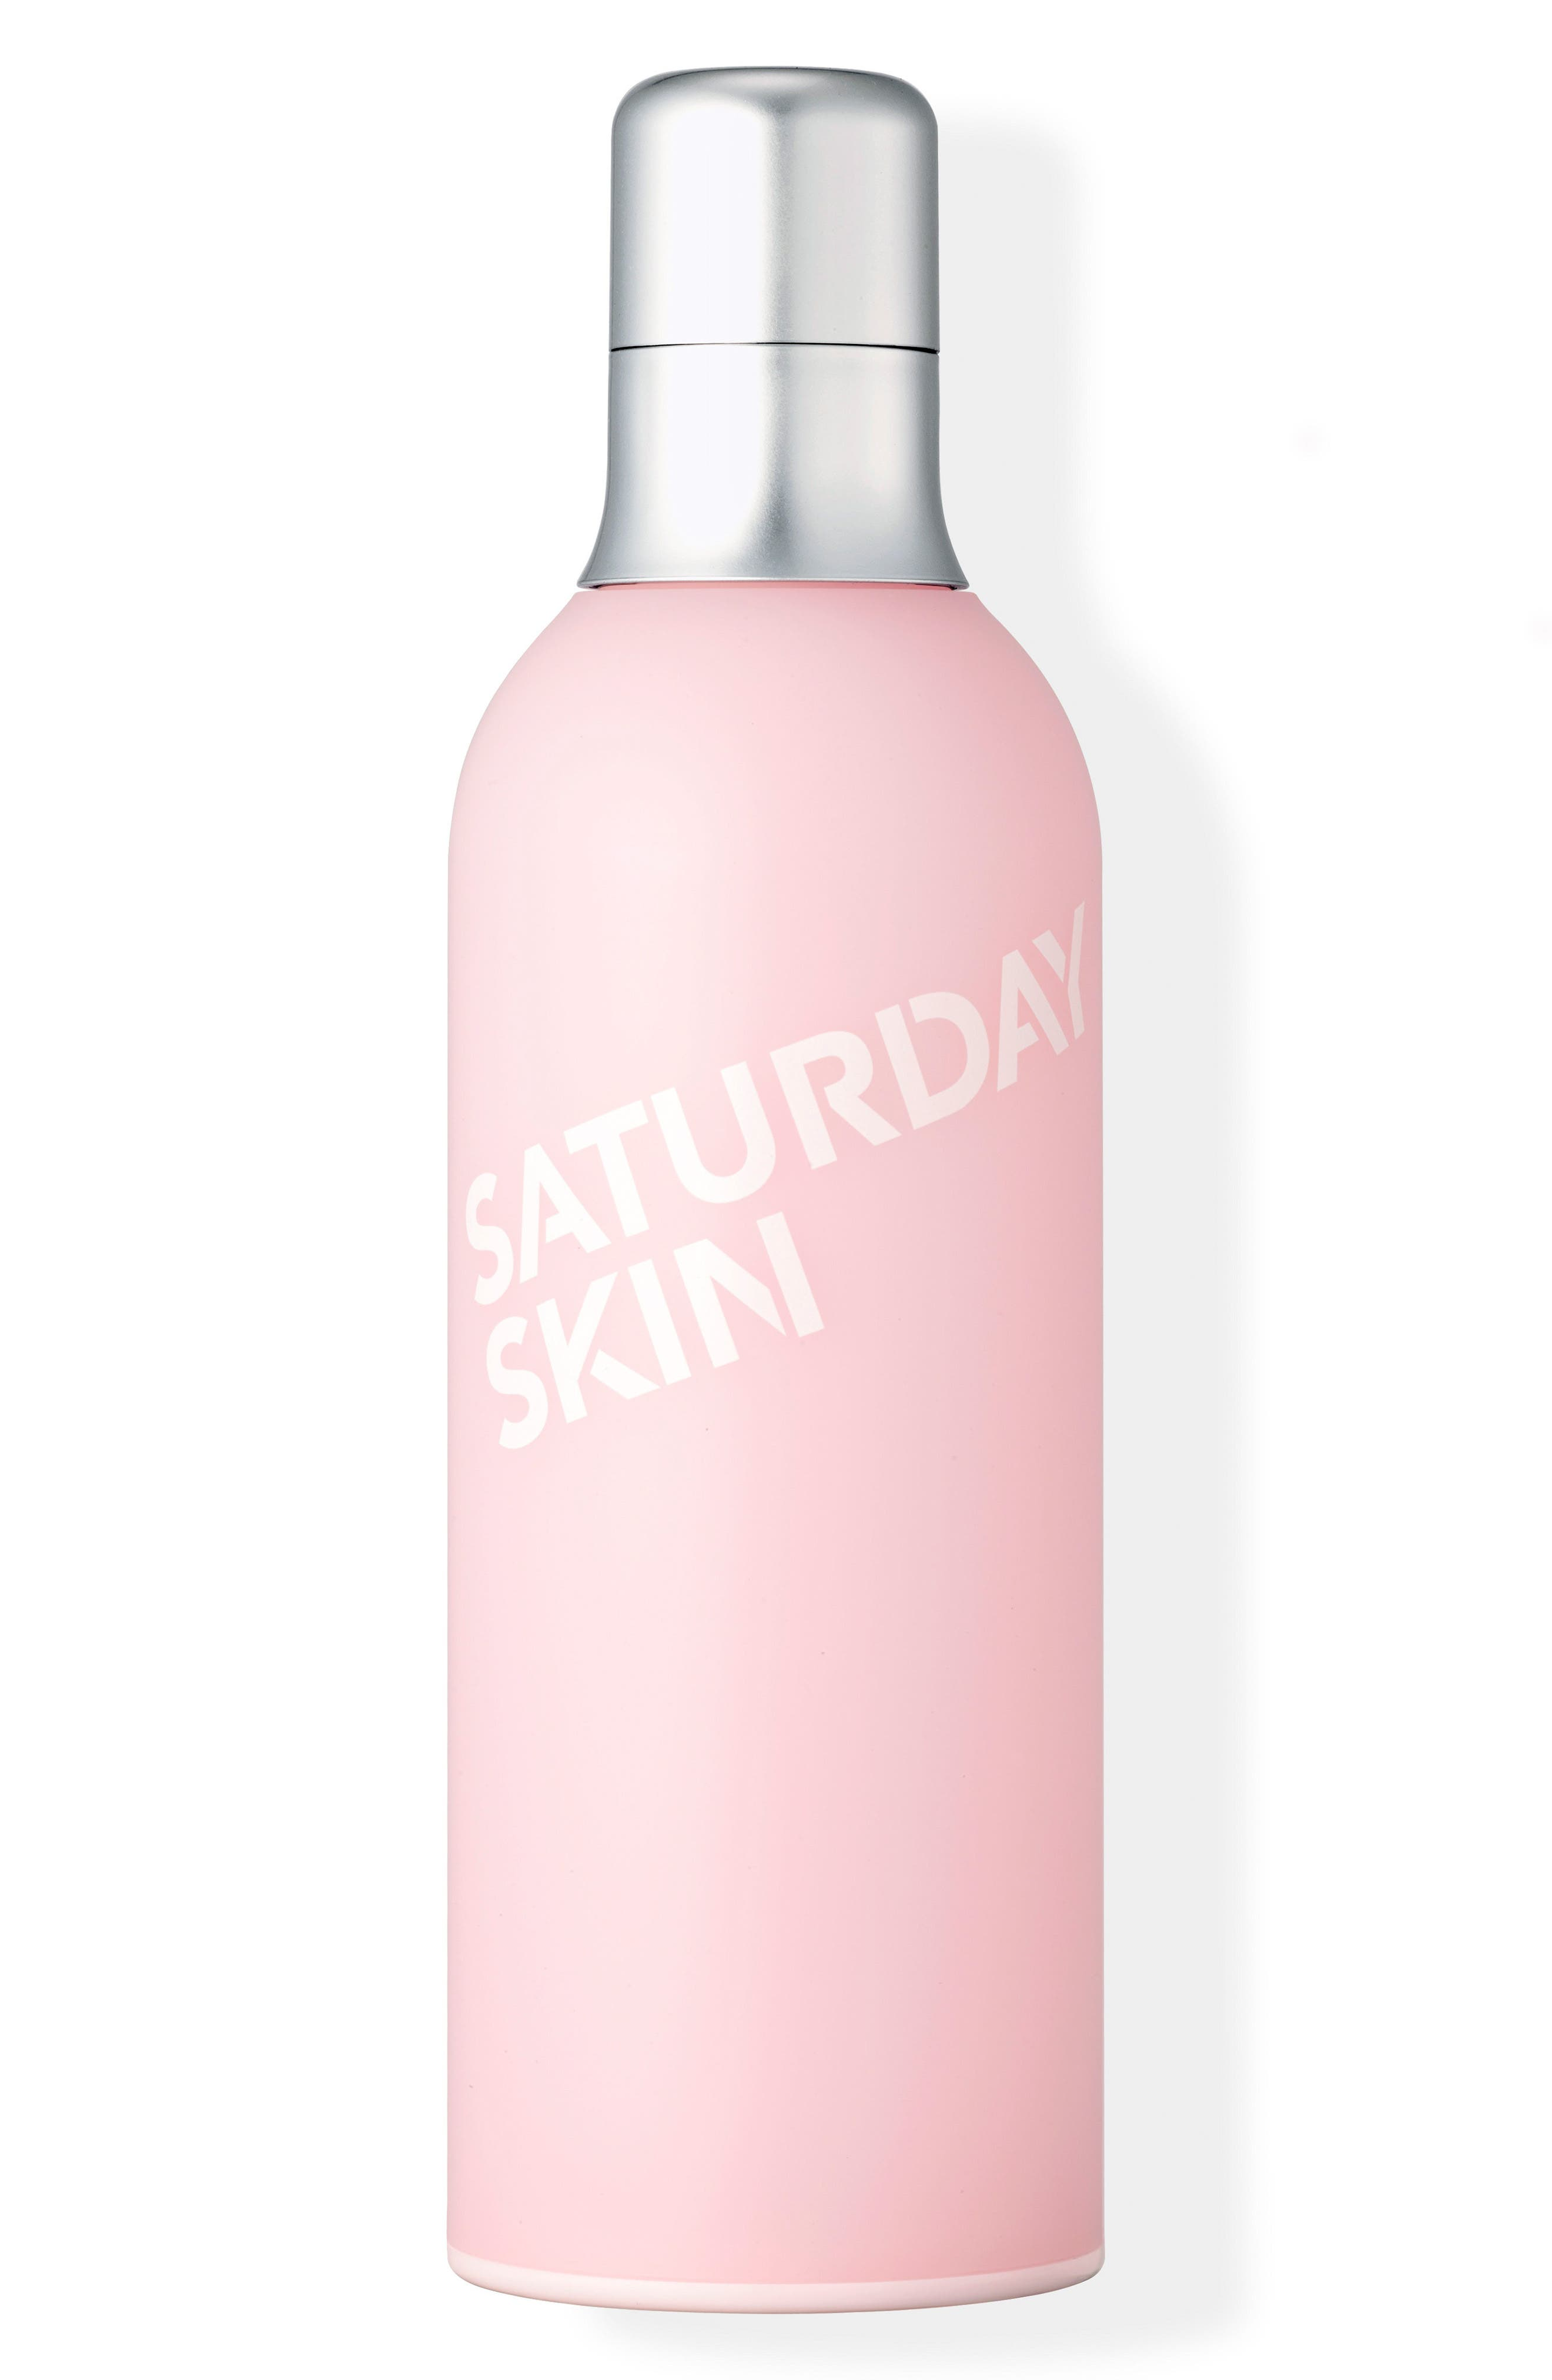 Saturday Skin Balancing Act Skin Smoothing Lotion